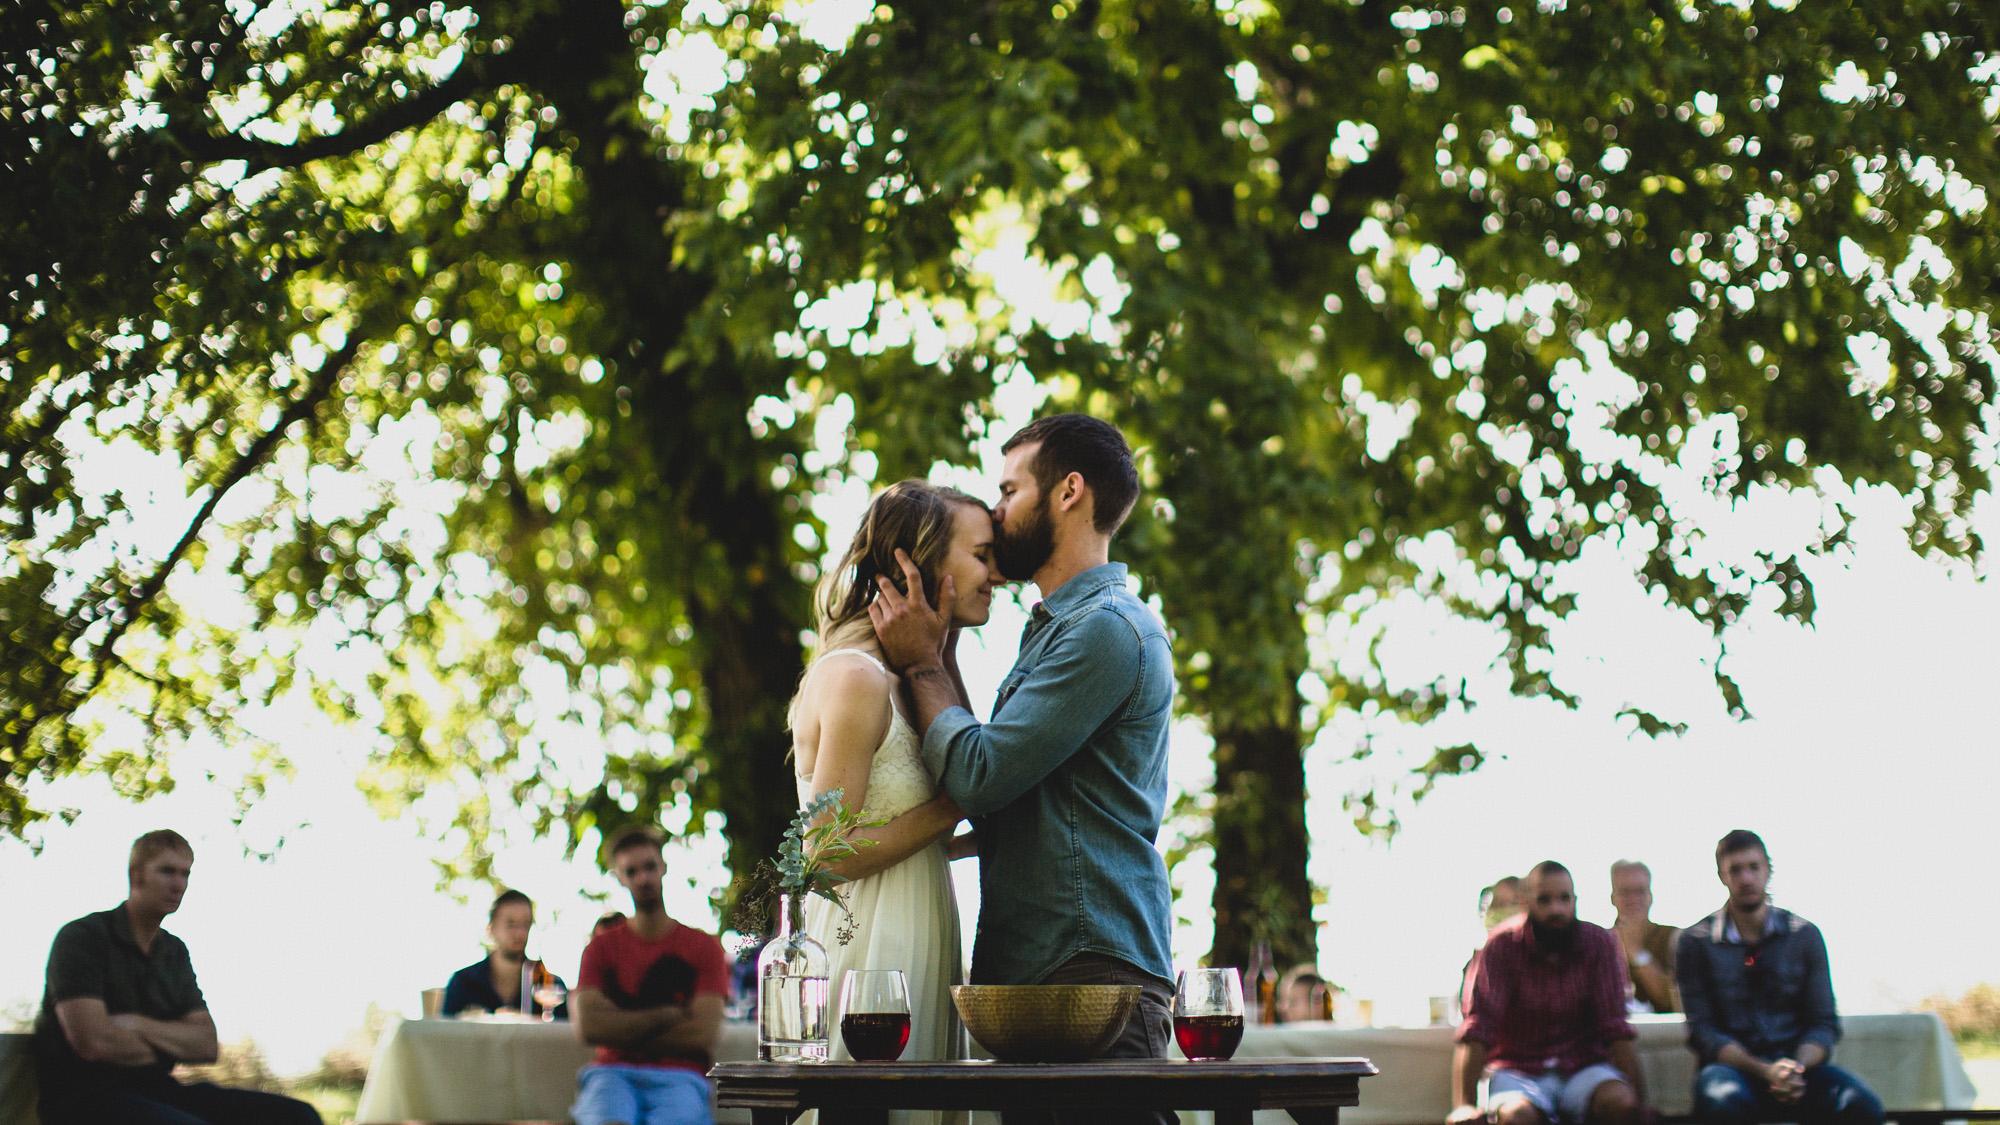 alec_vanderboom_springfield_missouri_wedding-0016.jpg